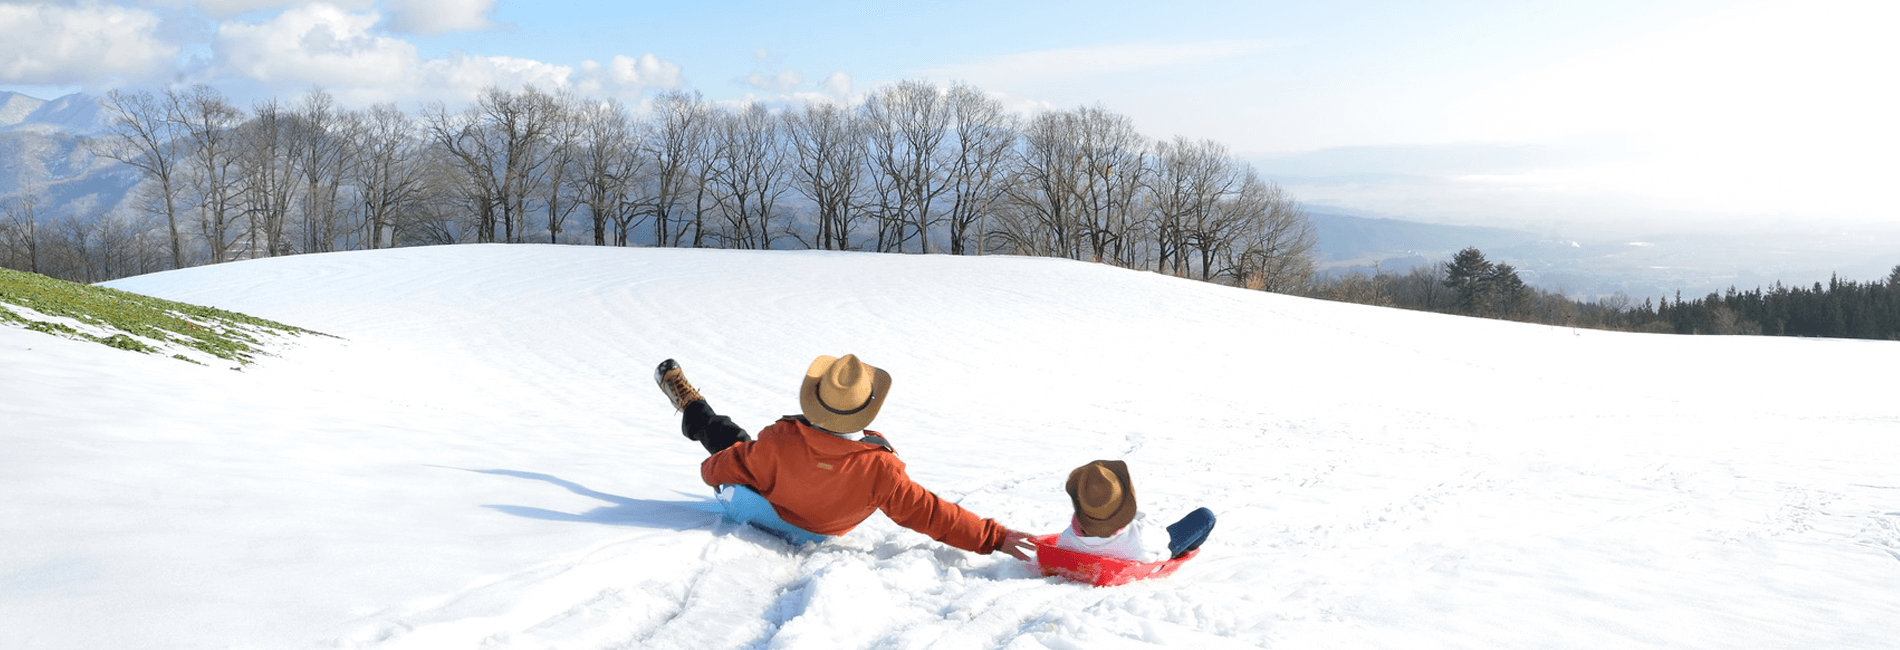 About >> Day Tour From Tokyo: Tambara Ski Park & Strawberry Picking - KKday